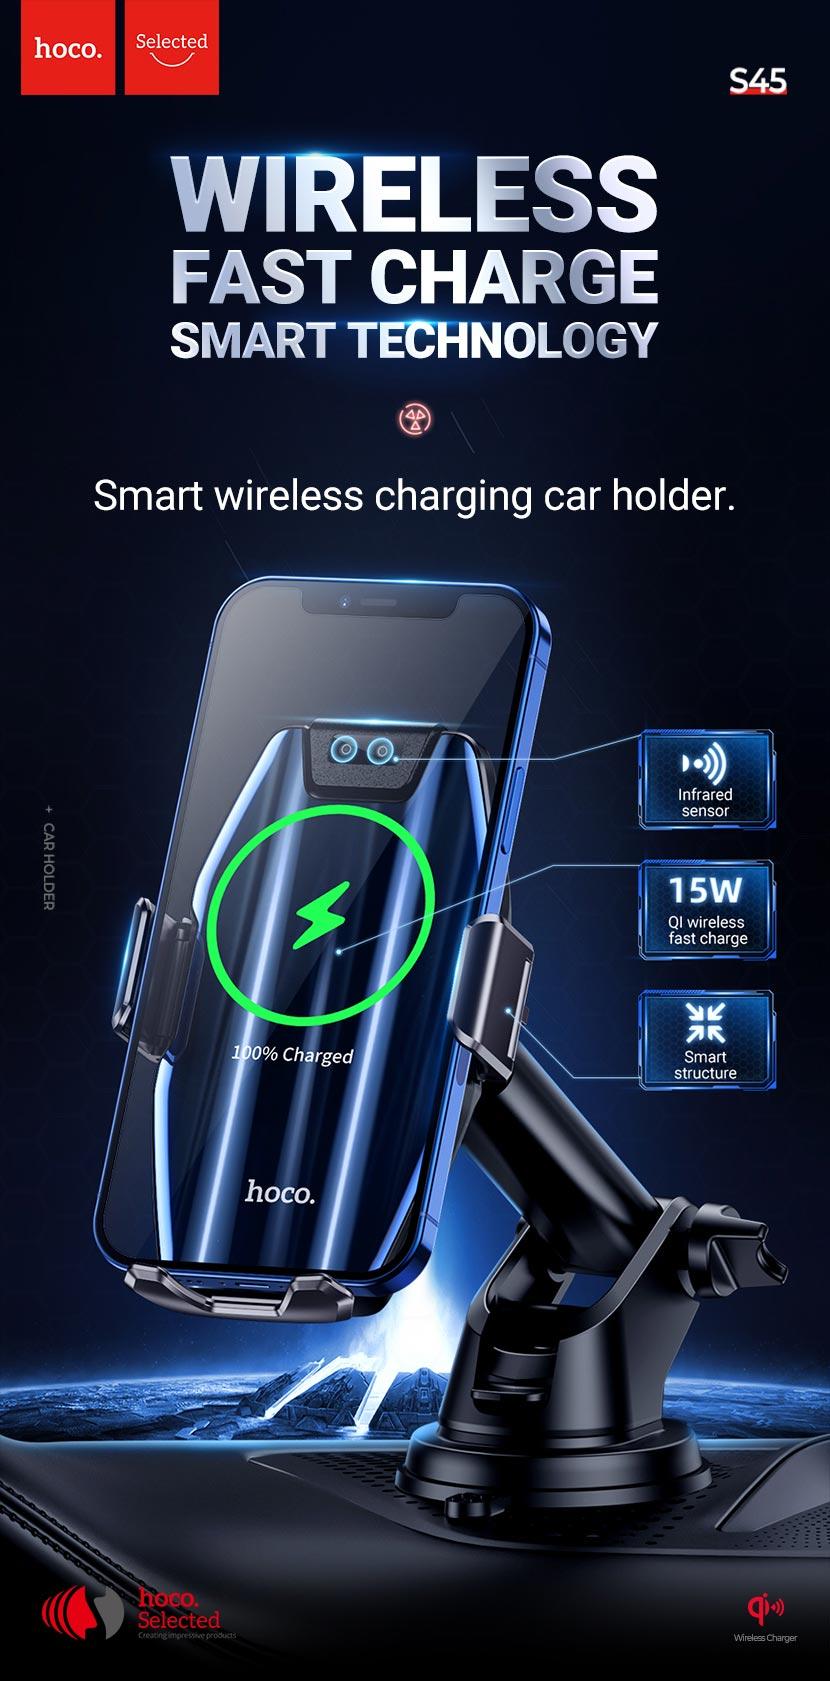 hoco selected s45 energia smart wireless charging car holder en